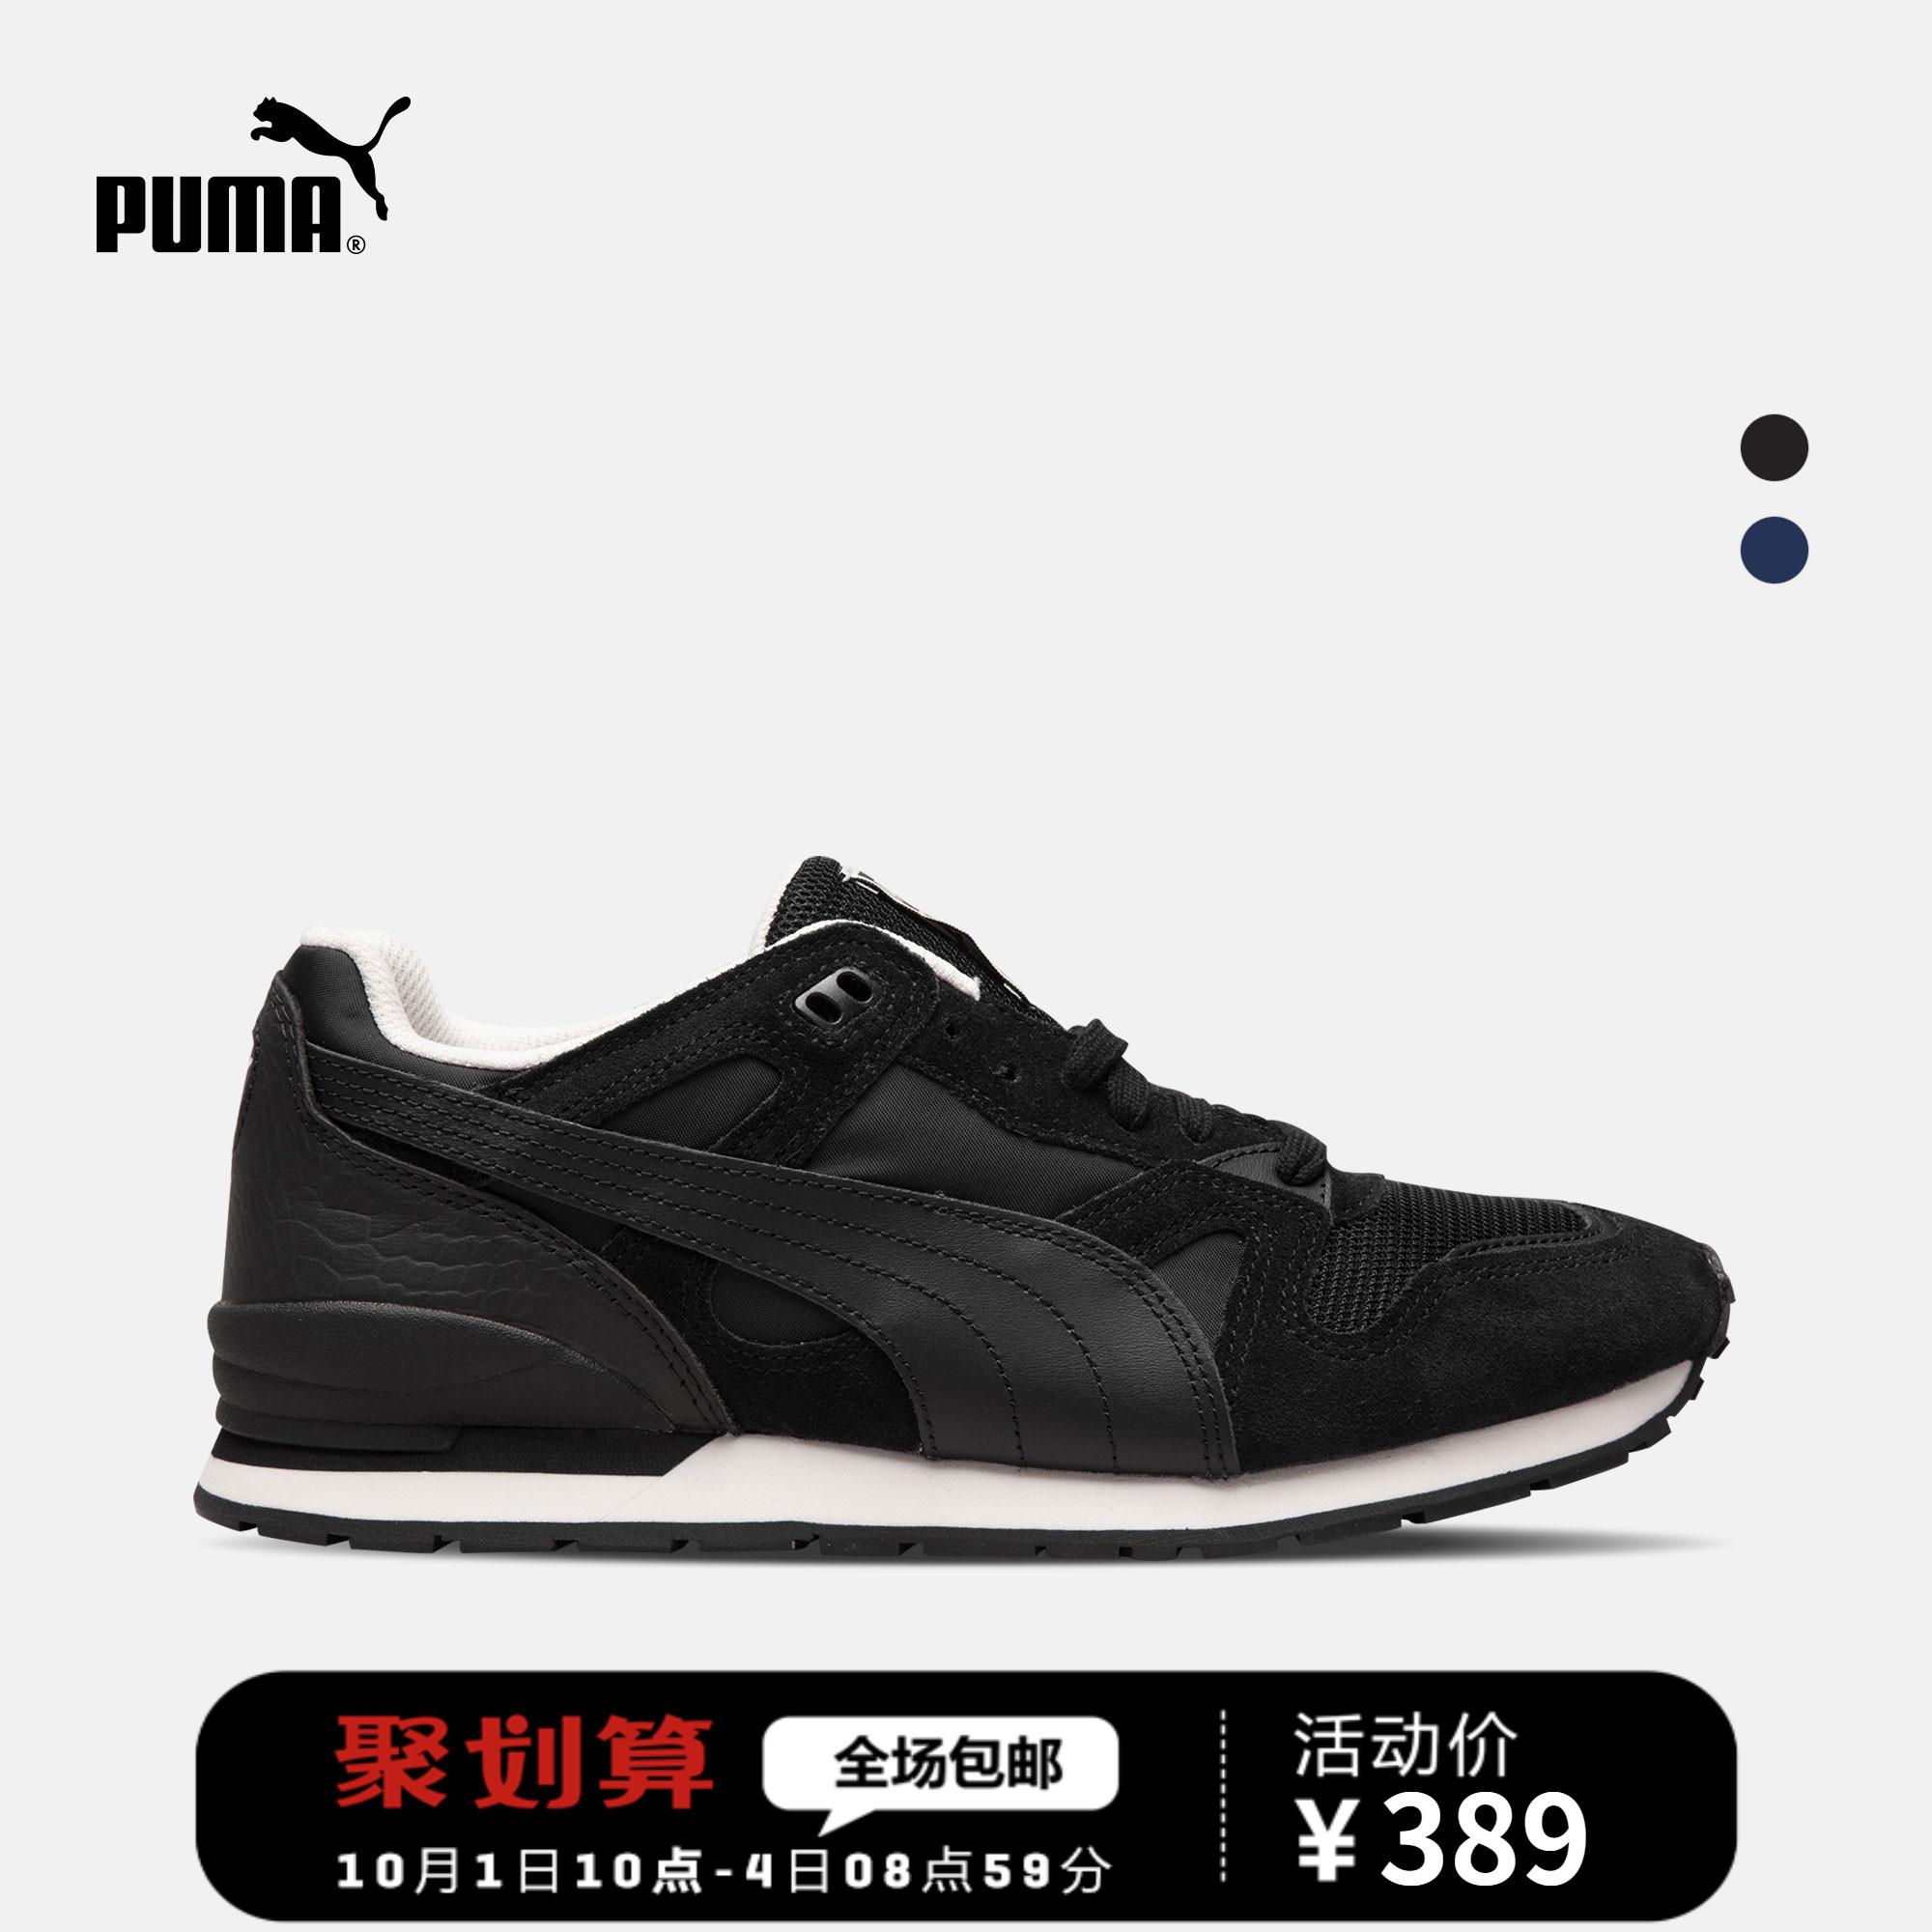 PUMA彪马官方 男女同款拼色休闲鞋 Duplex Colorblock 363769